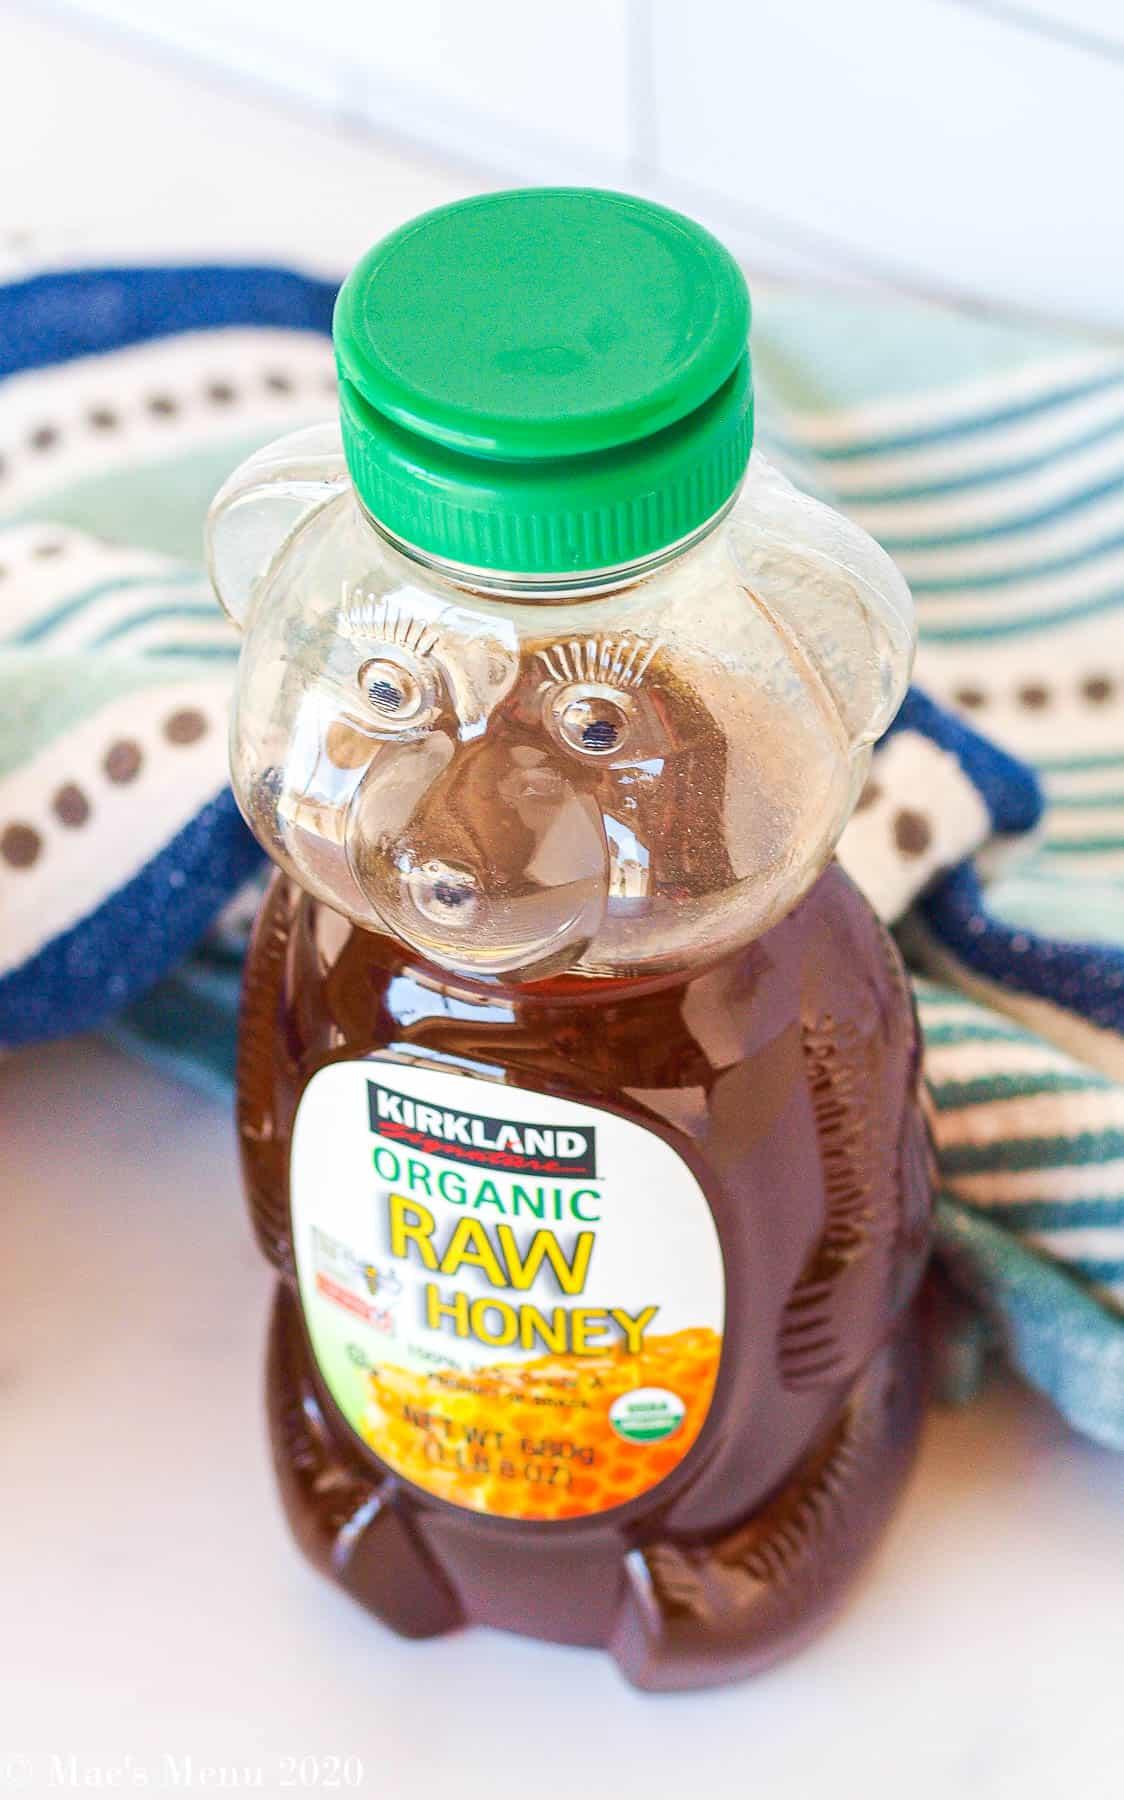 An overhead shot of a bottle of costco organic raw honey